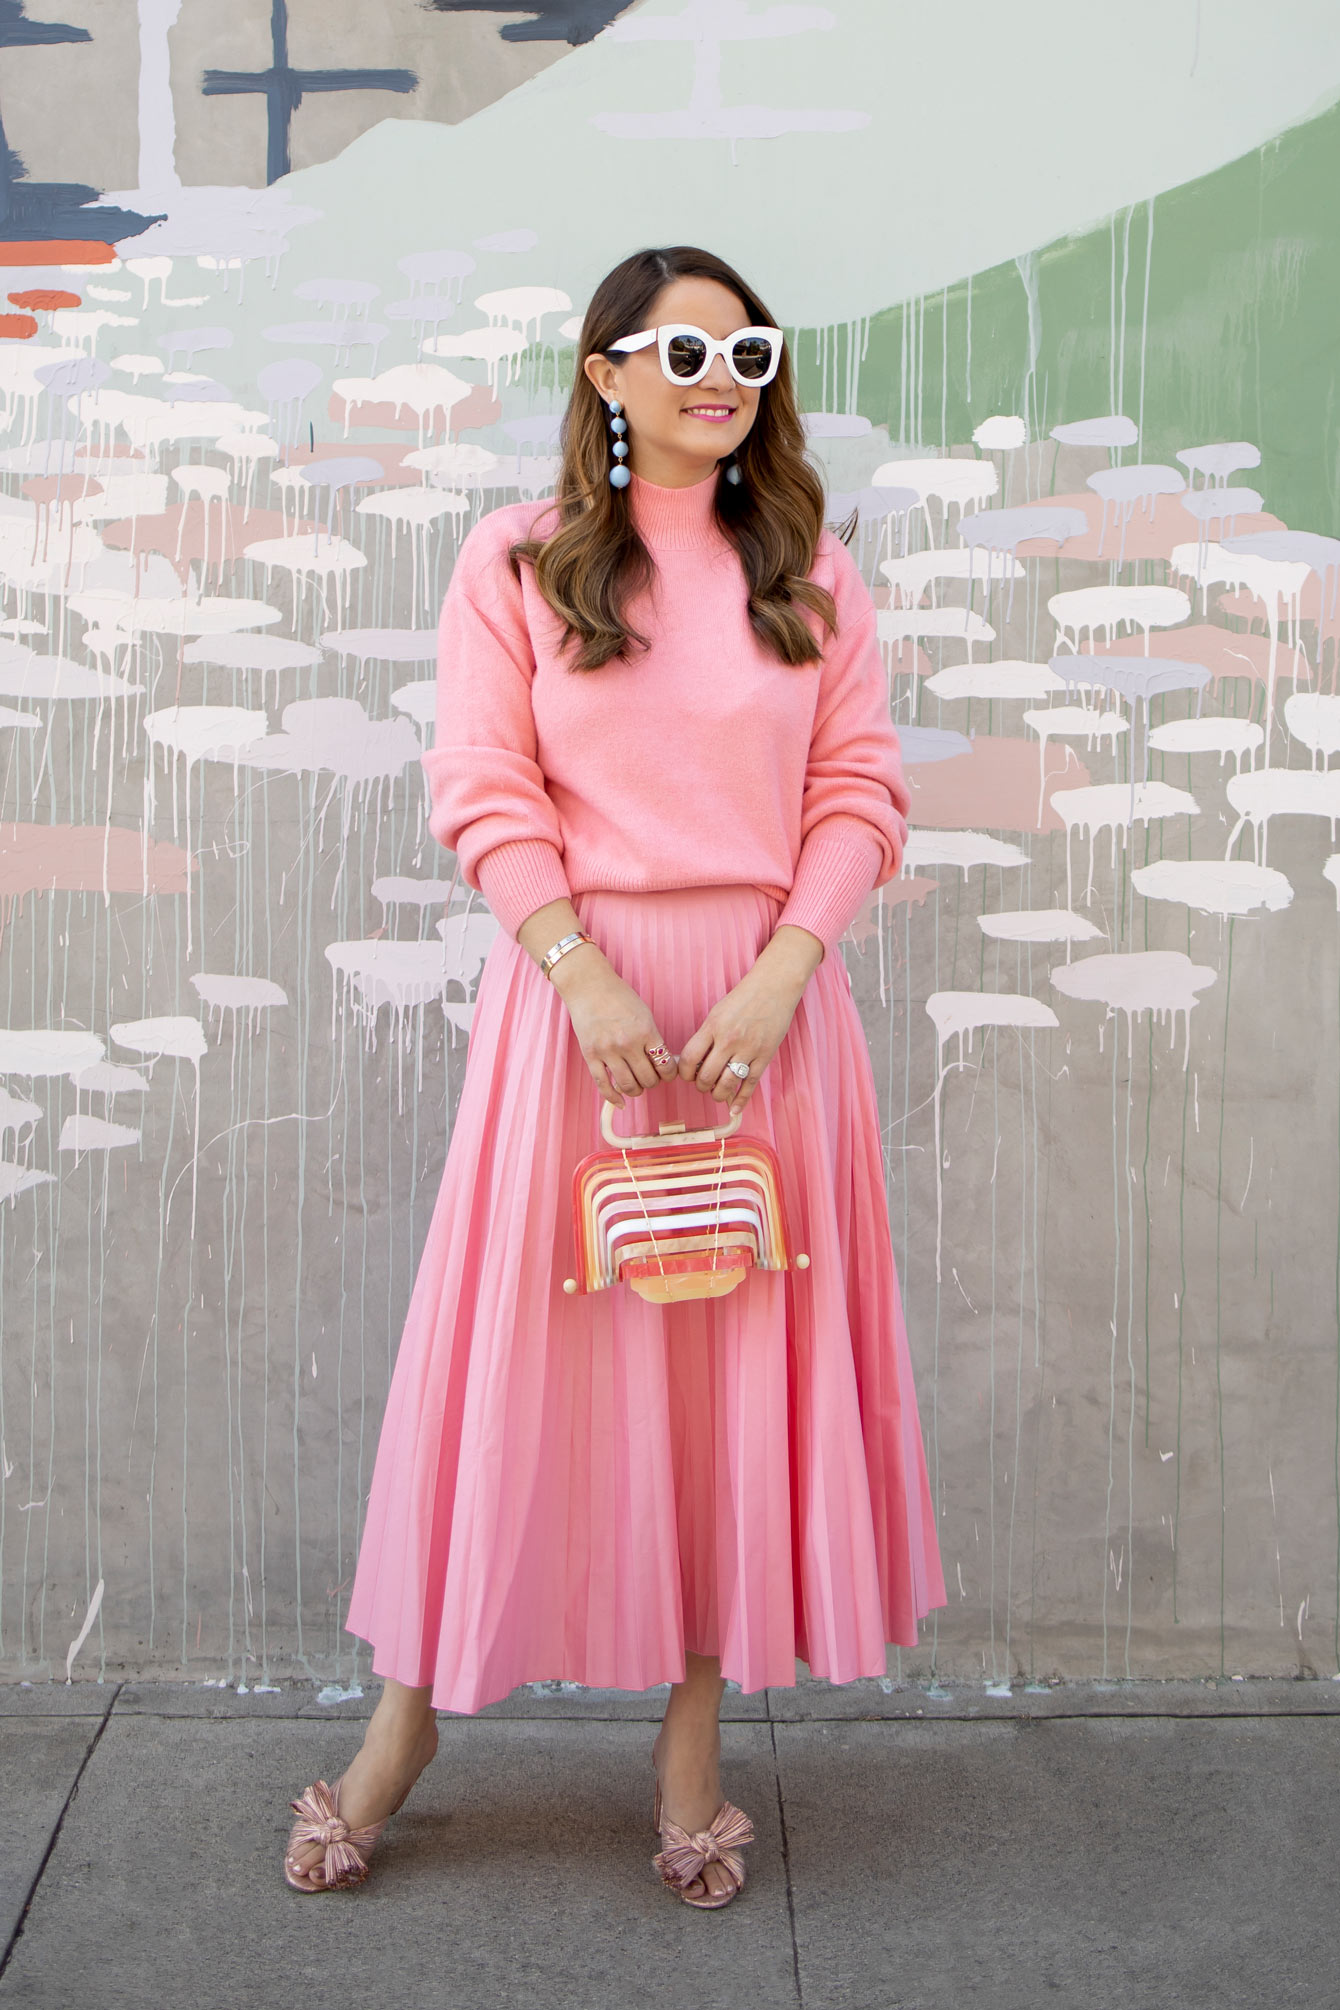 Glamorous Pink Pleated Skirt